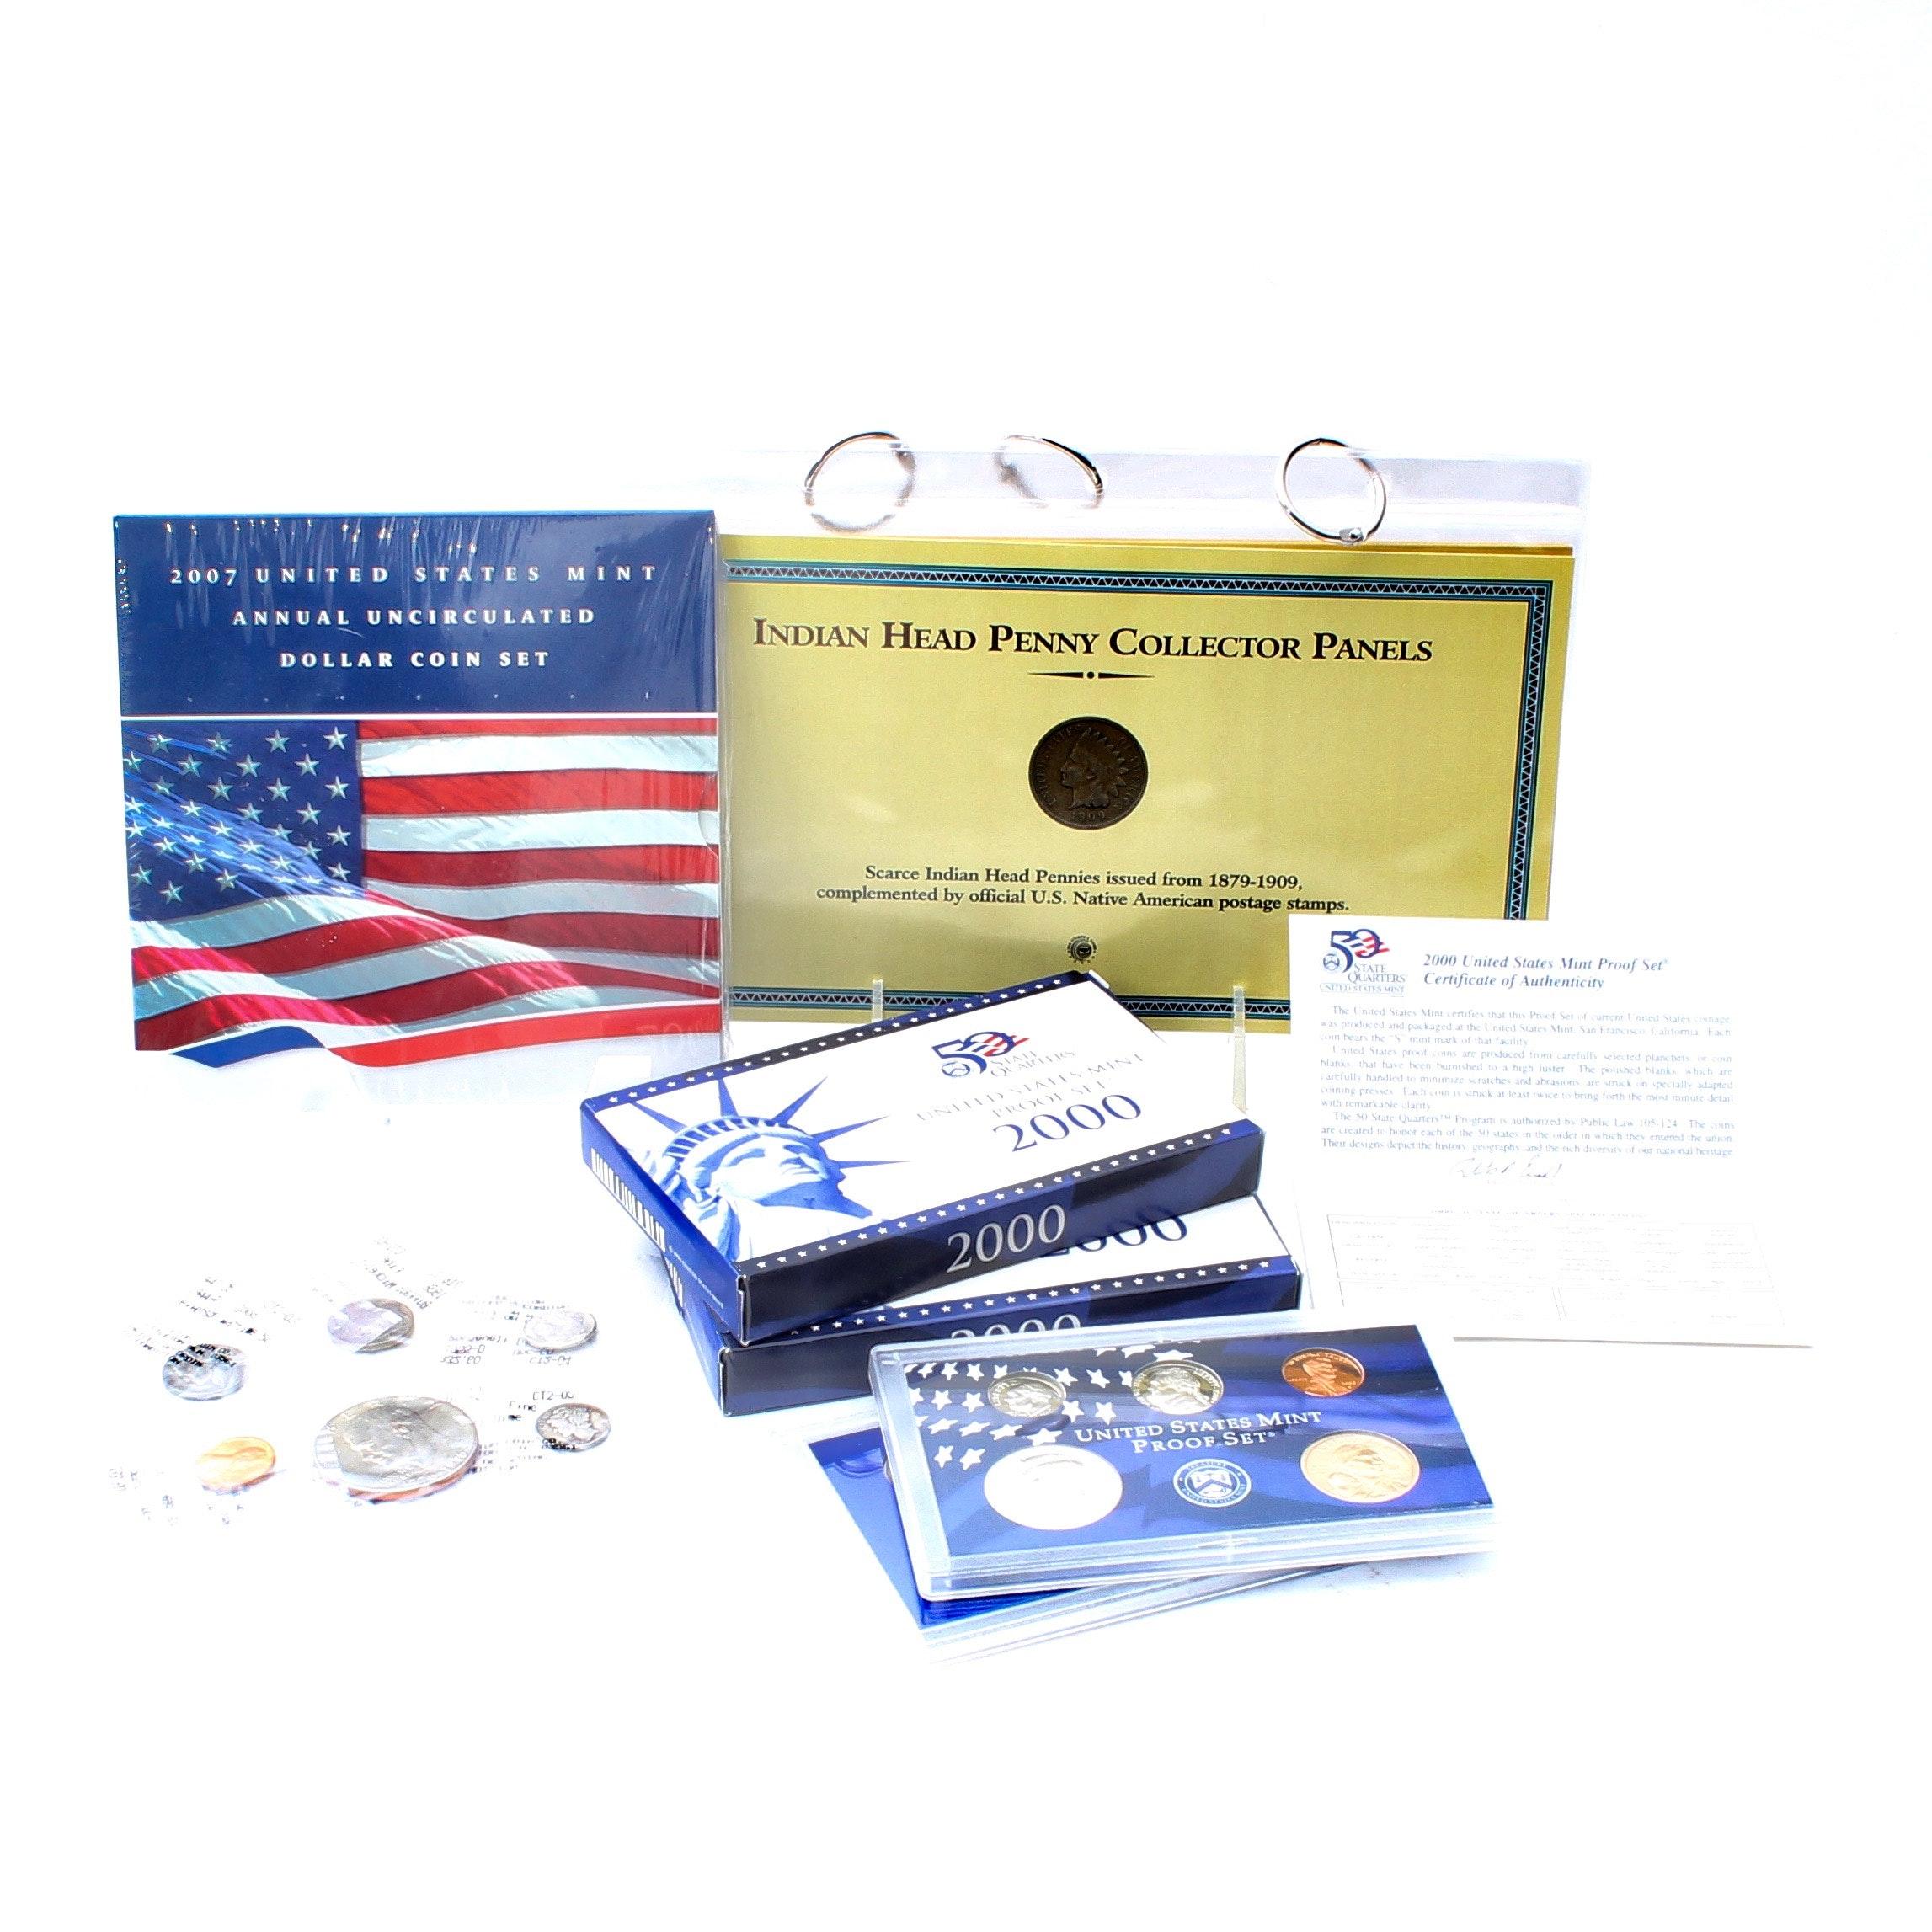 Vintage U.S. Coins and Proof Sets